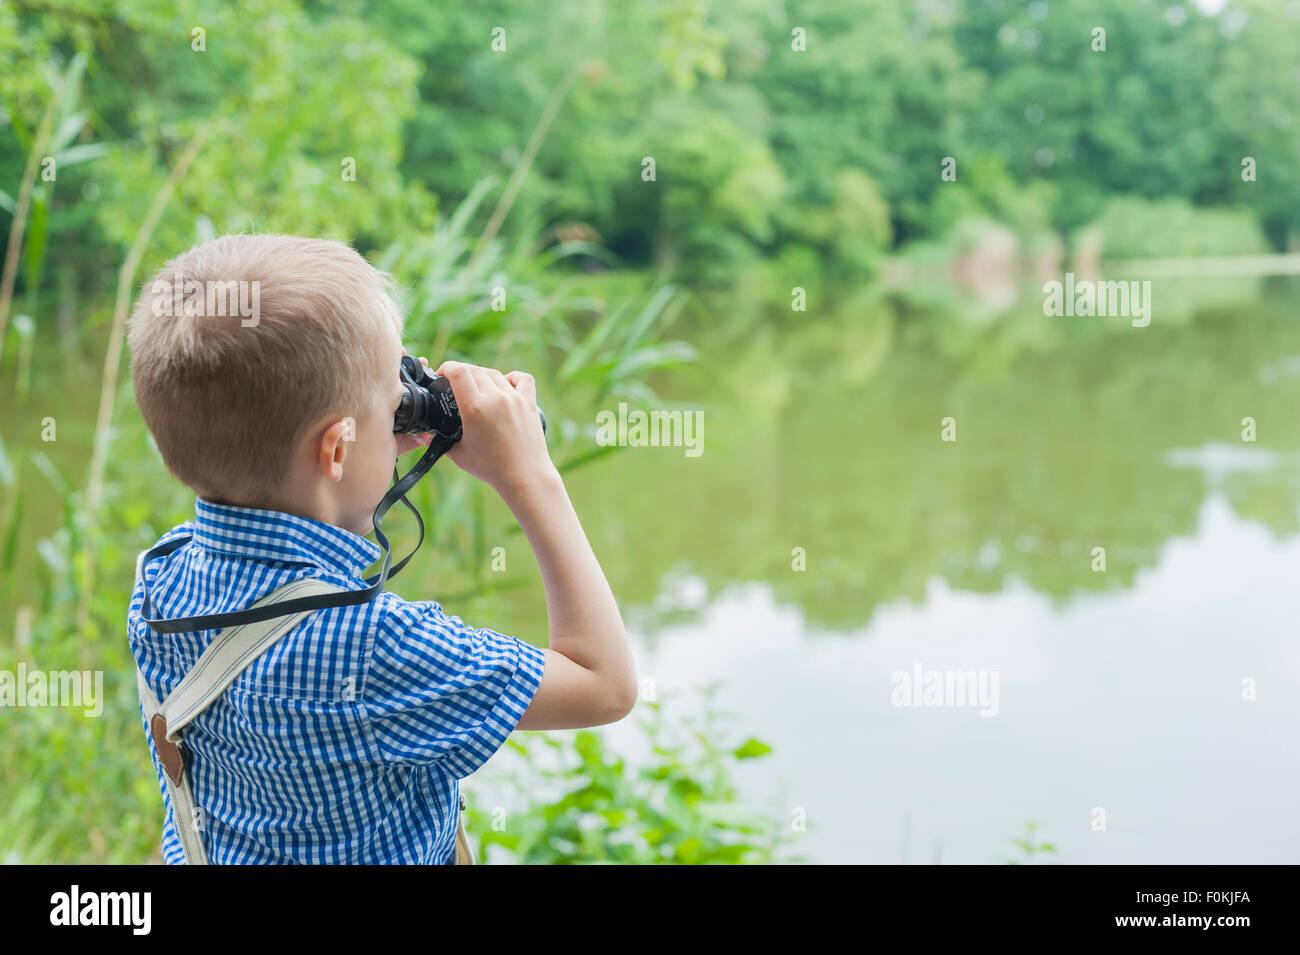 Germany, Boy with binoculars watching animals - Stock Image